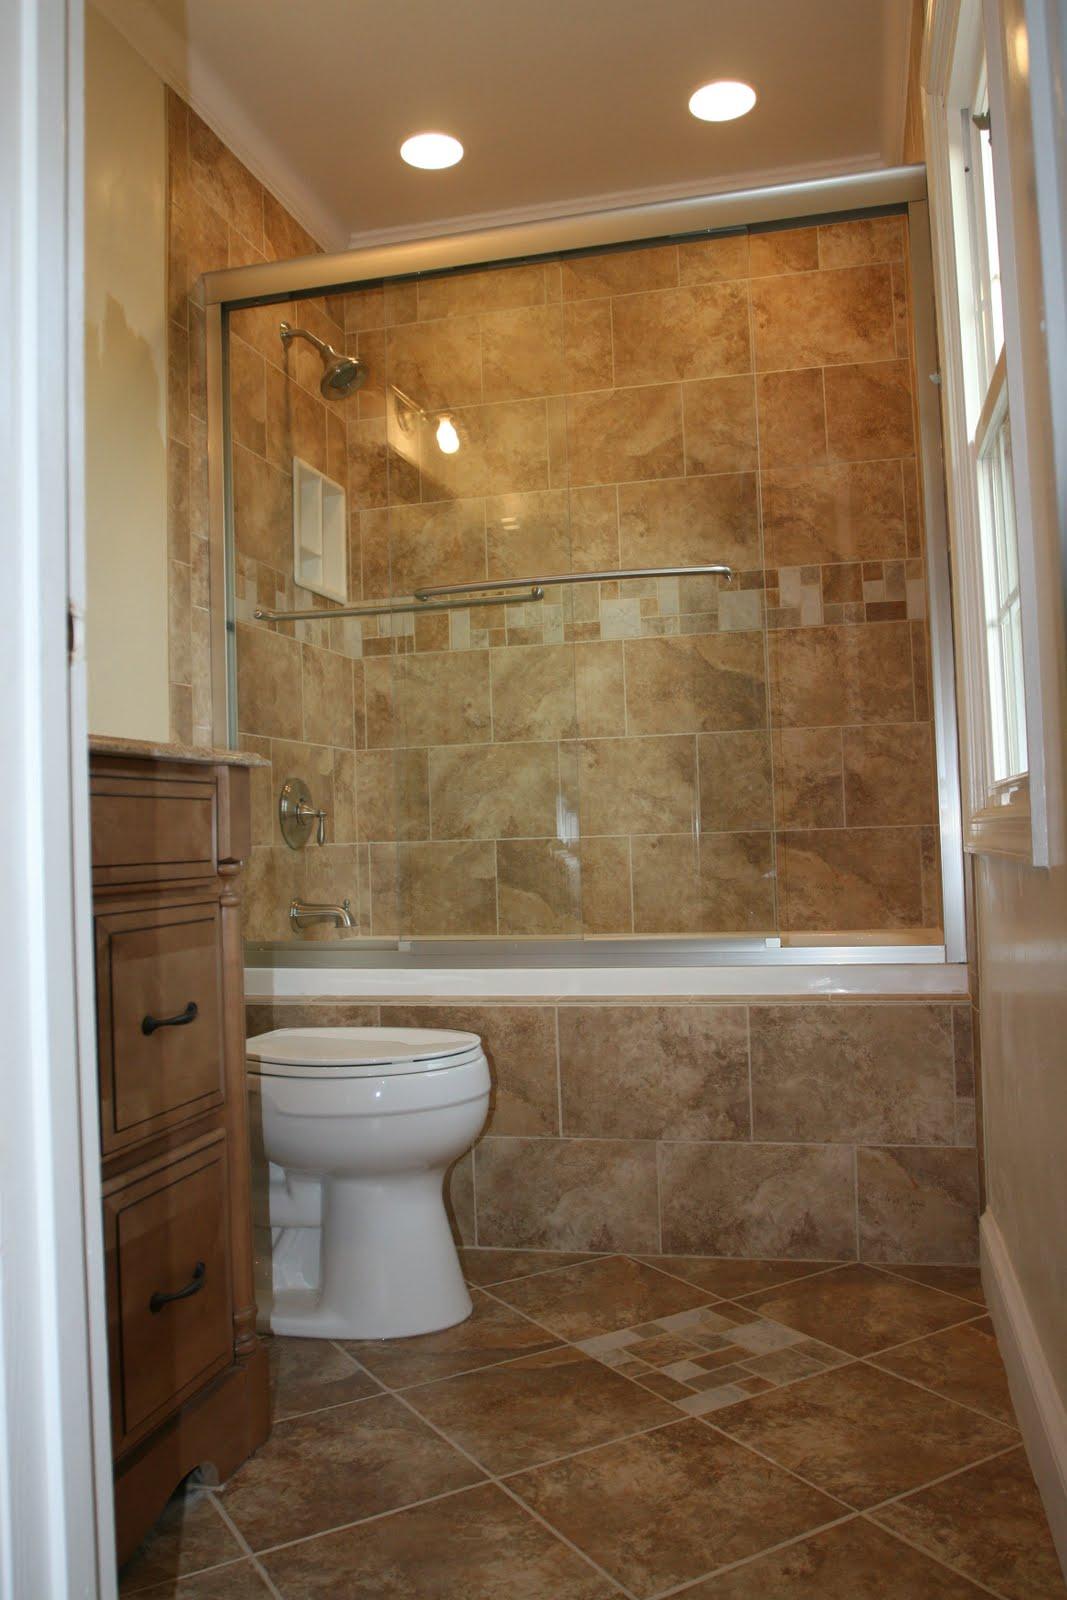 Bathroom Vanity Idea (View 7 of 20)